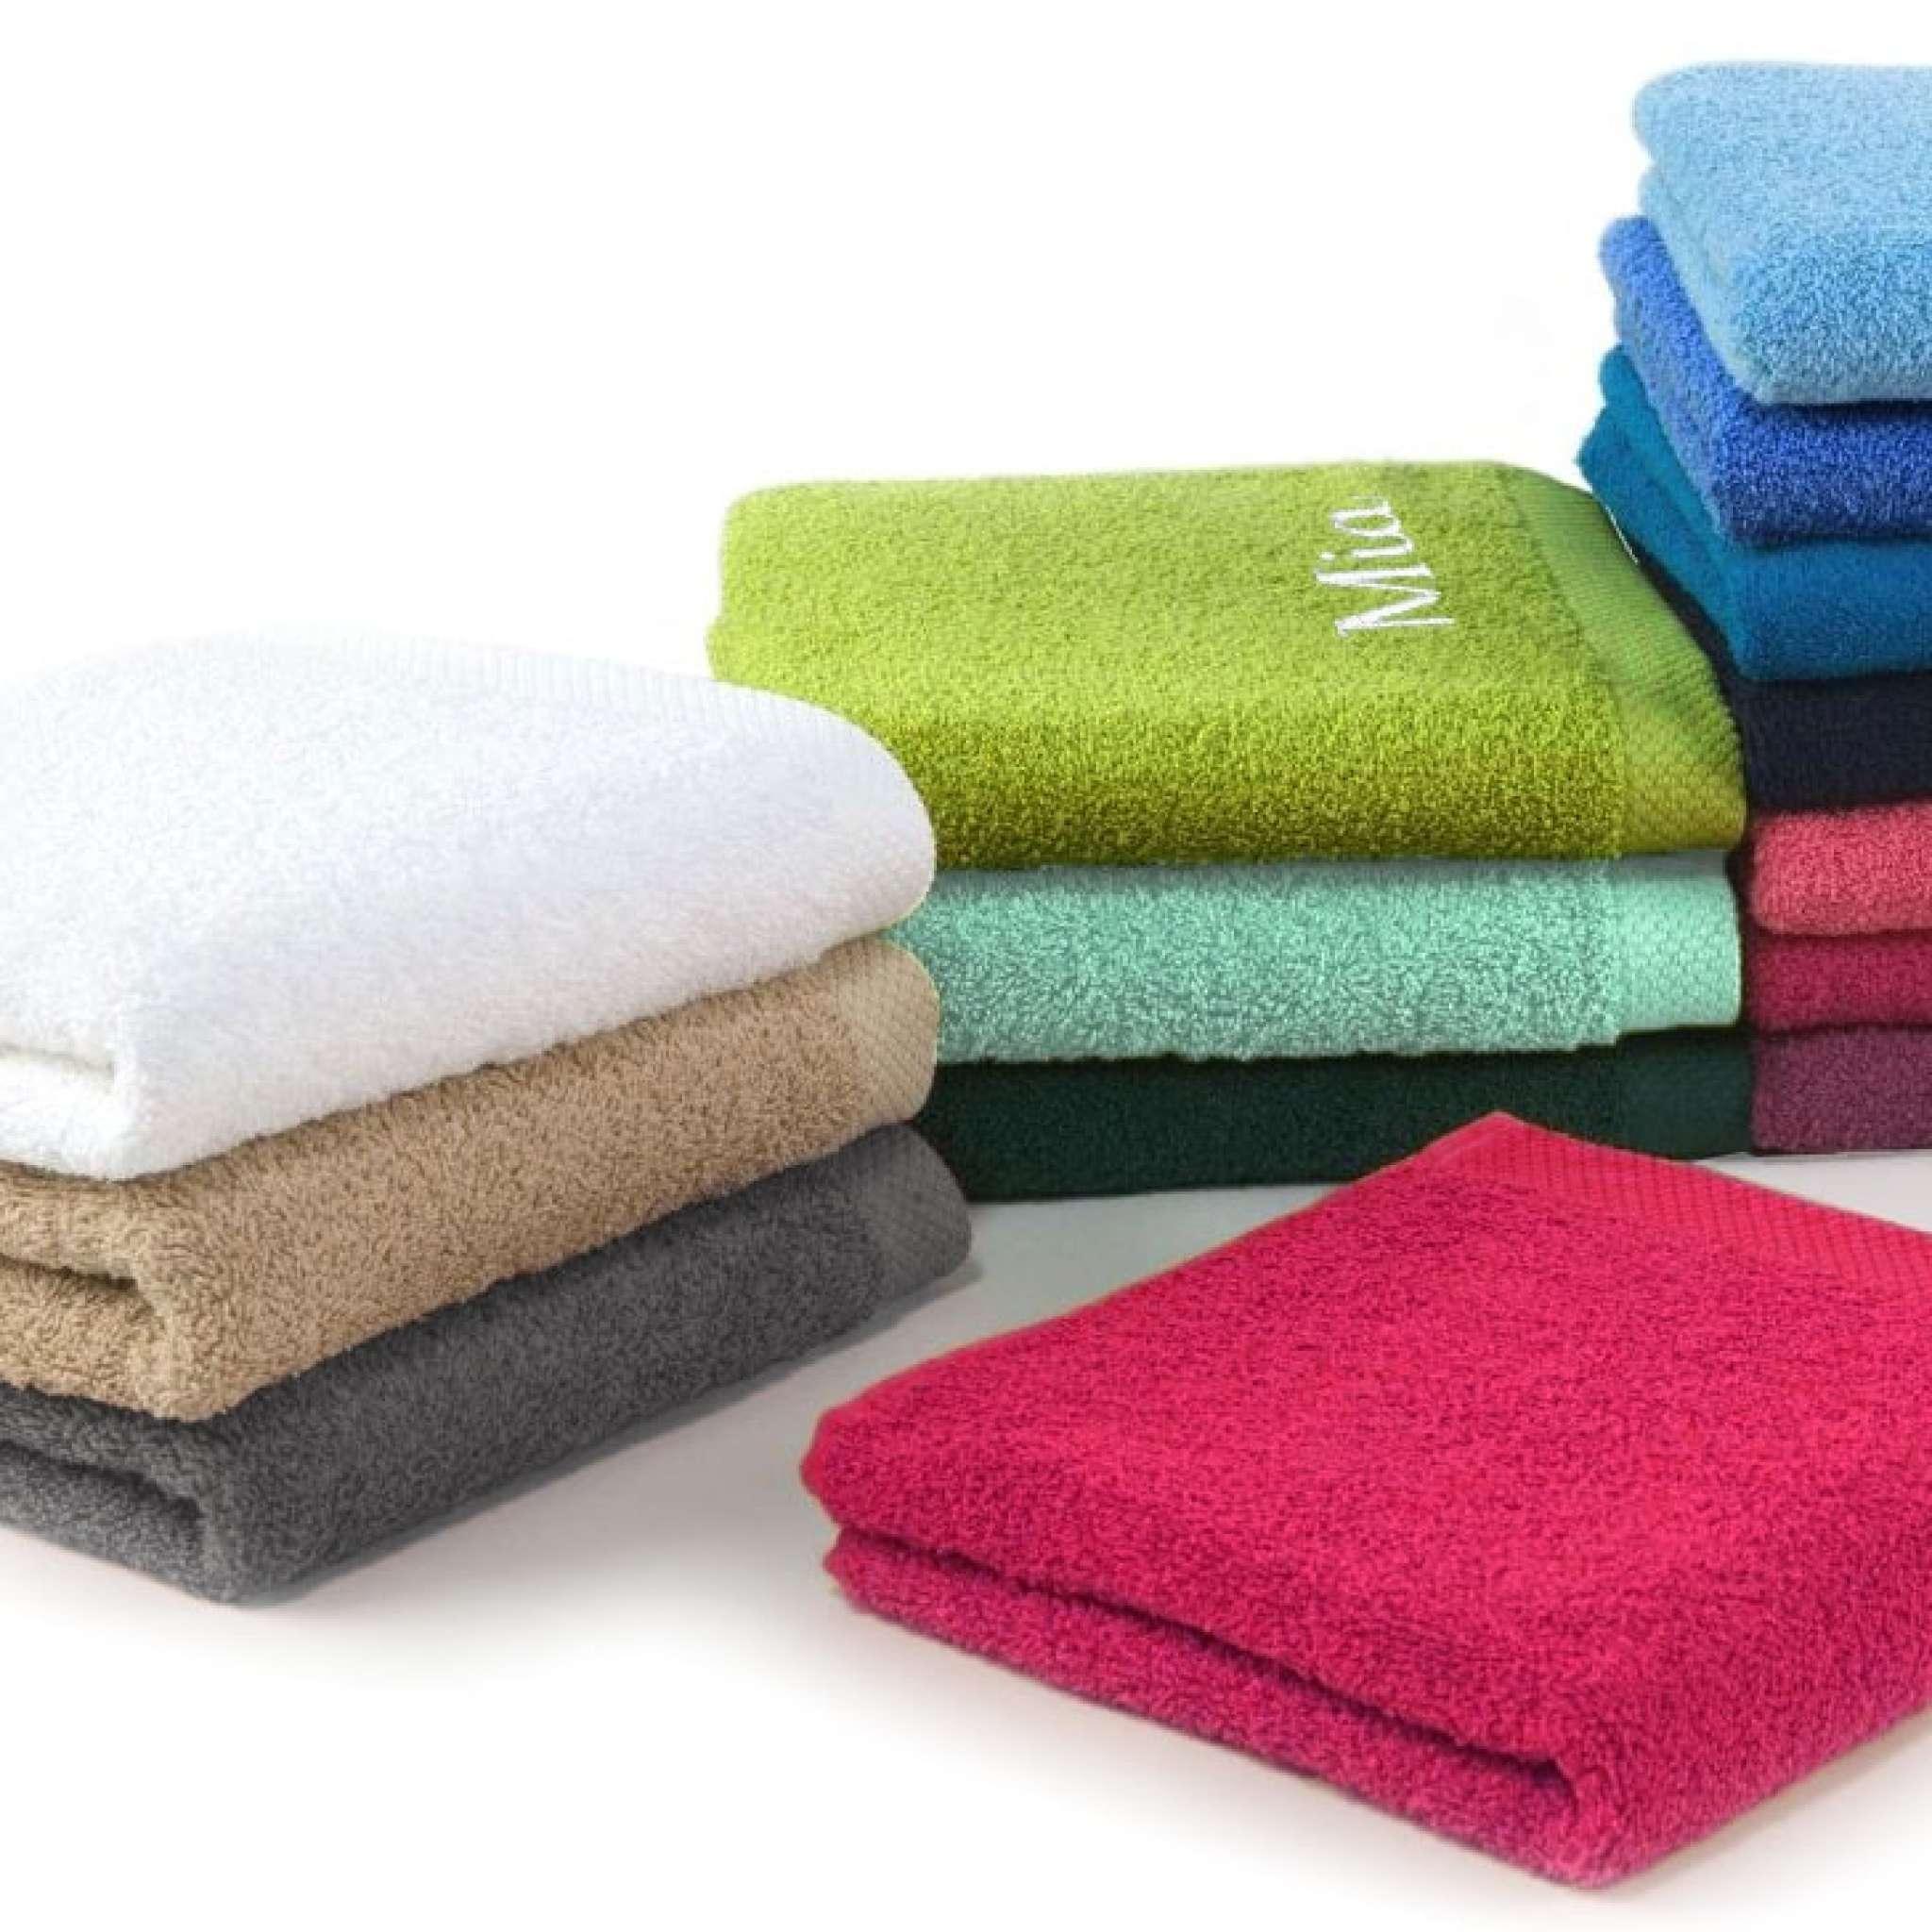 Handtuch mit Namen | Pure exclusive